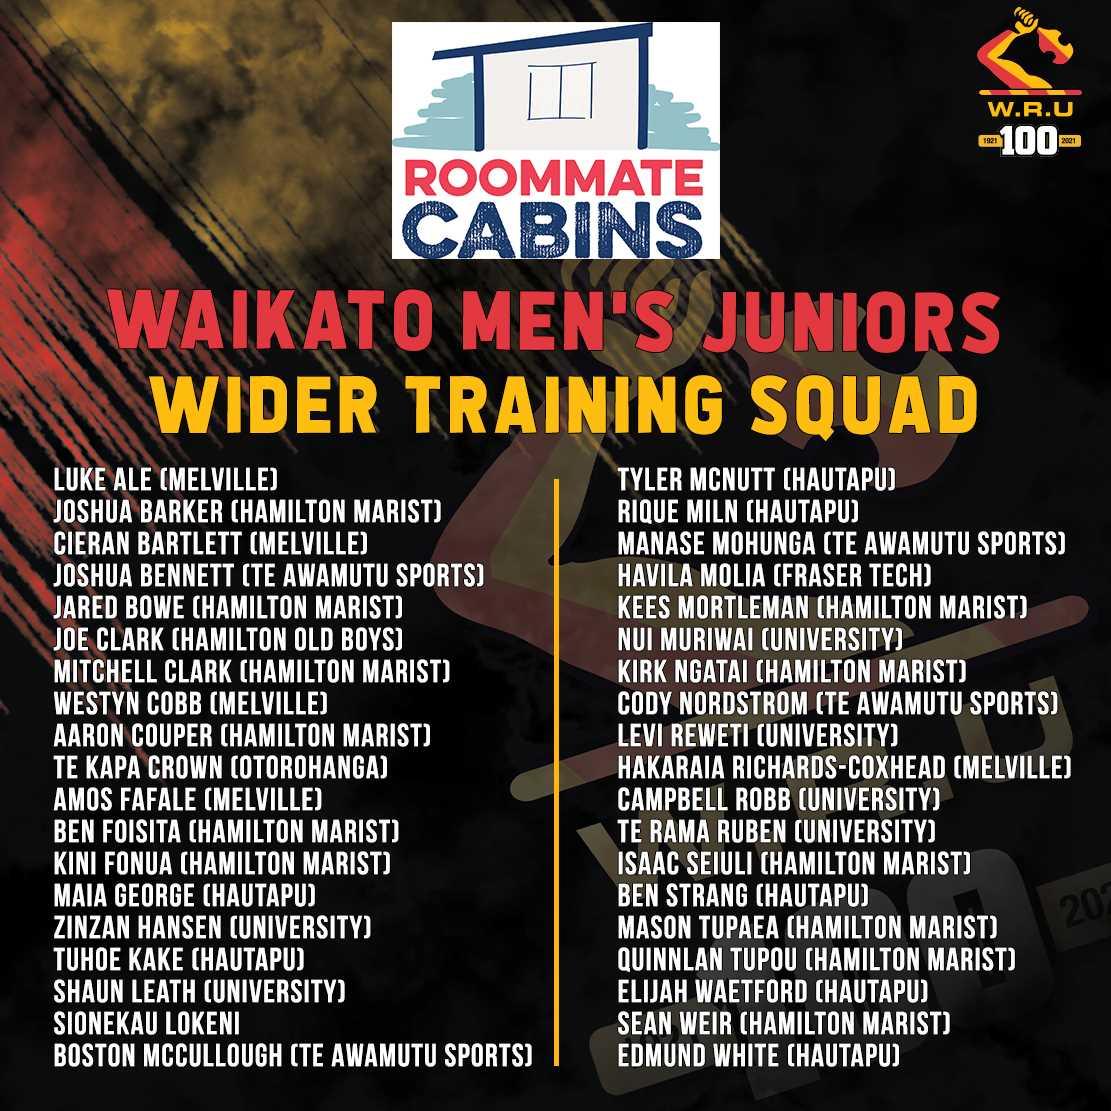 2021 Roommate Cabins: Waikato Men's Juniors Wider Training Squad Announced